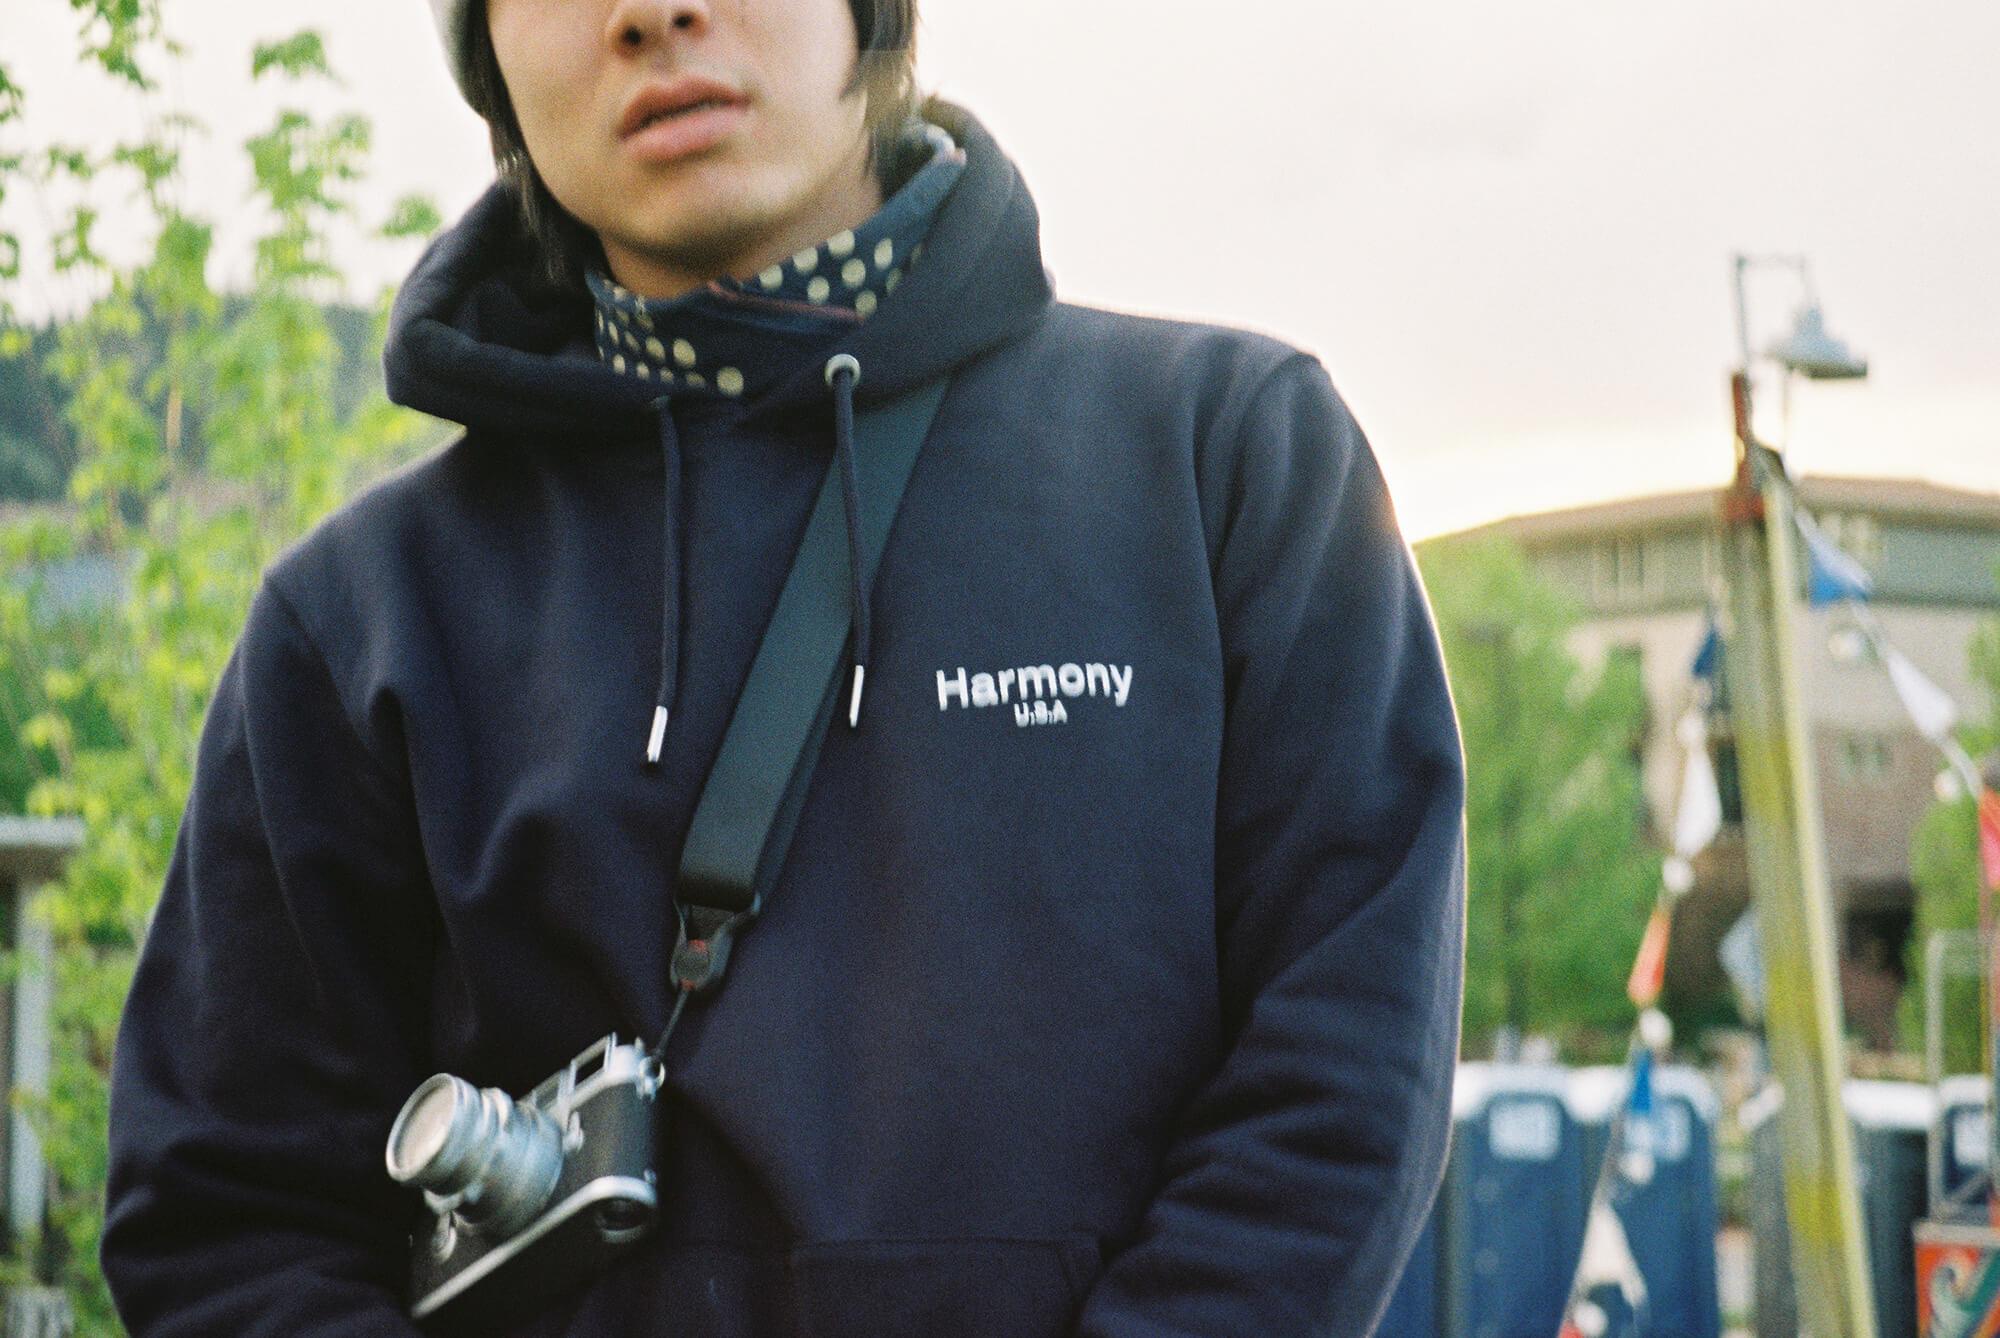 harmony paris clothing on body 4